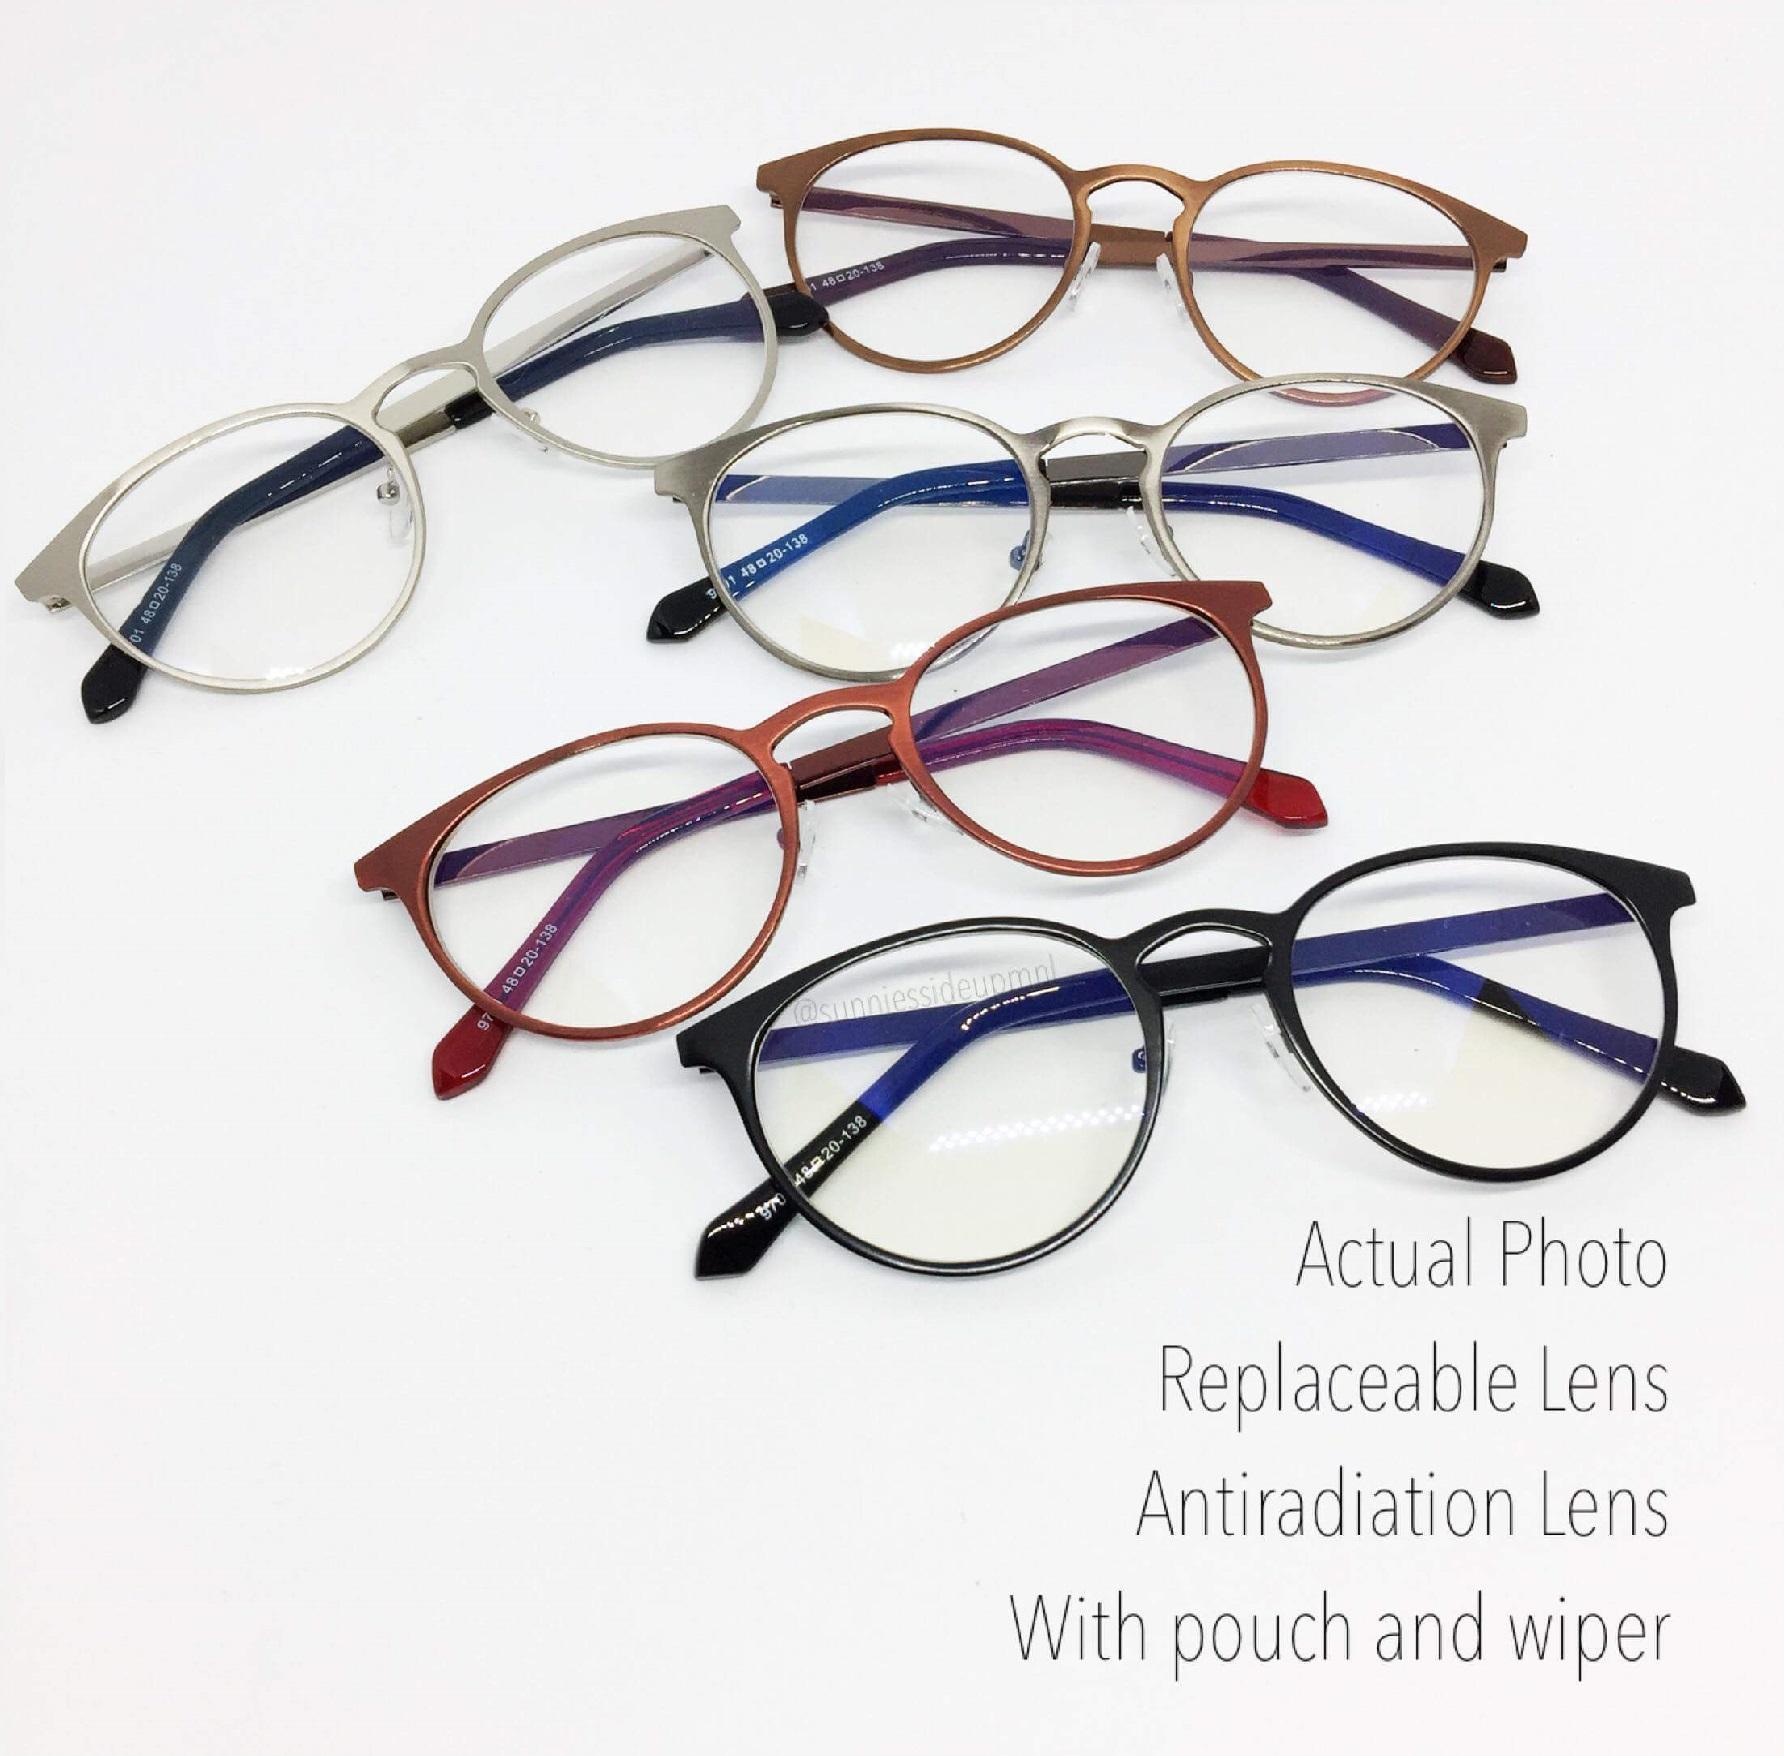 AMIRA Antiradiation Eyeglasses - Replaceable Lens - Computer Glasses -  Metal Frame 984b438f3cb3